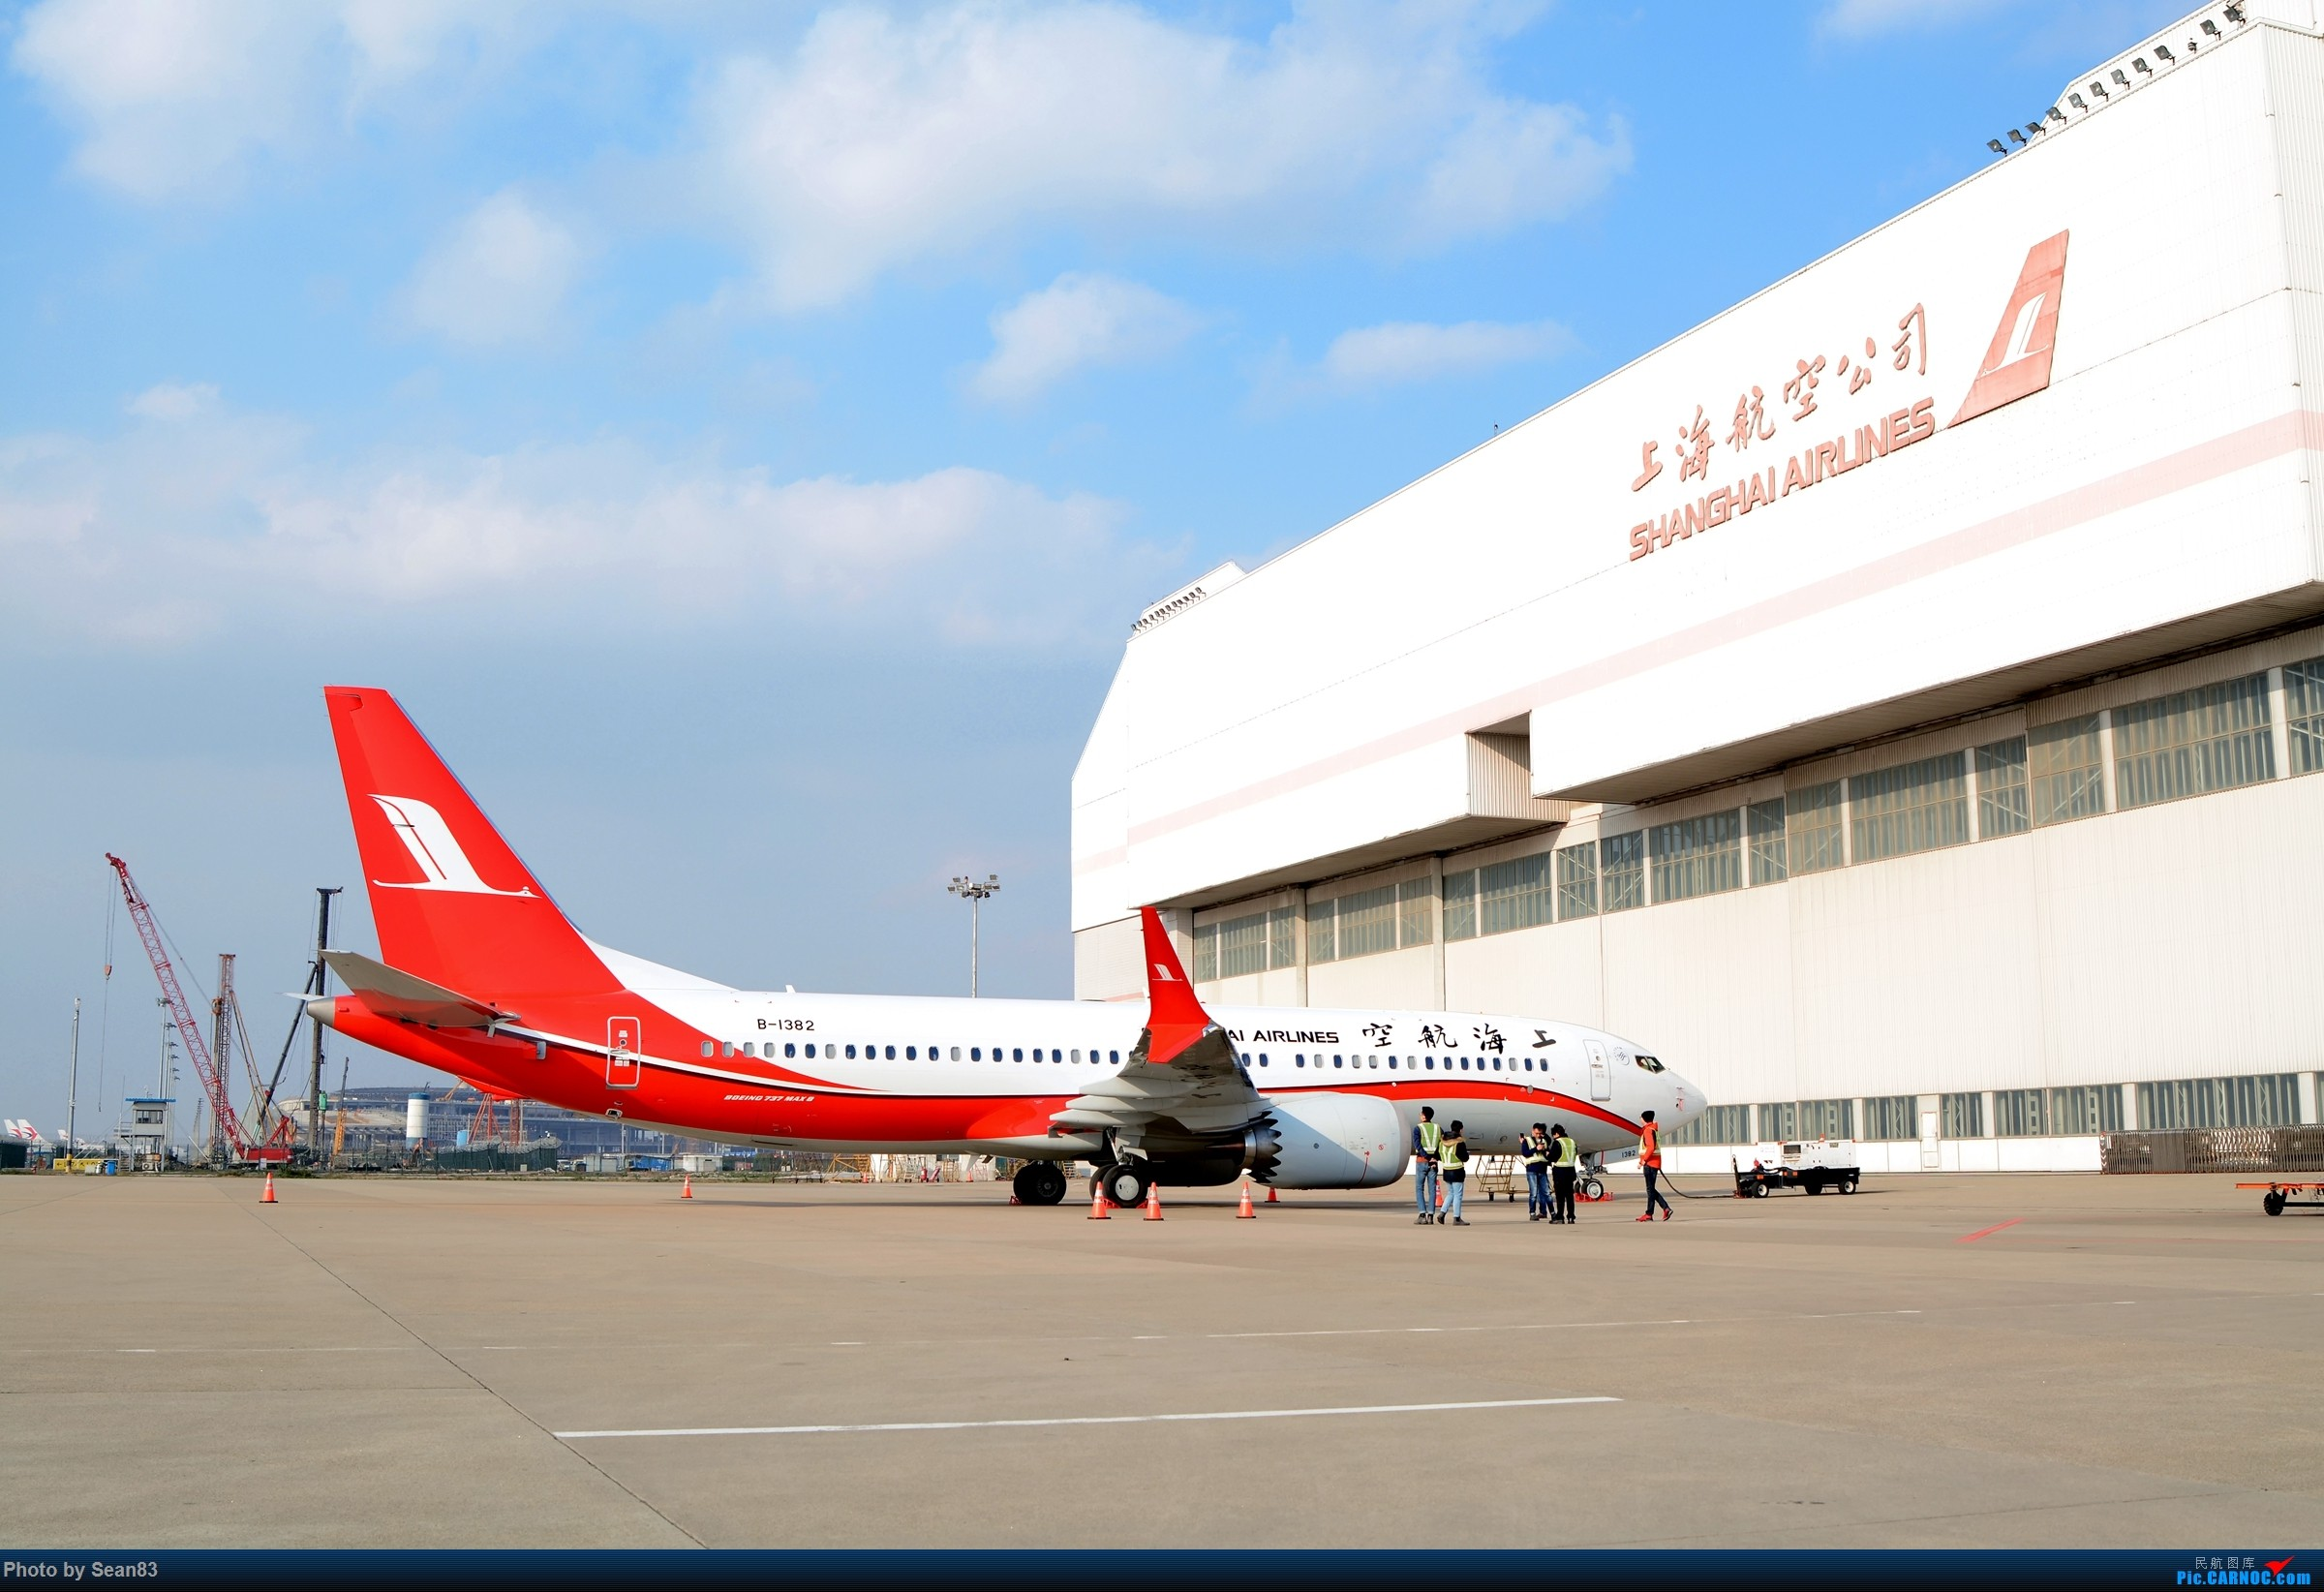 Re:来议论议论那家航空公司最好 BOEING 737MAX-8 B-1382 中国上海浦东国际机场